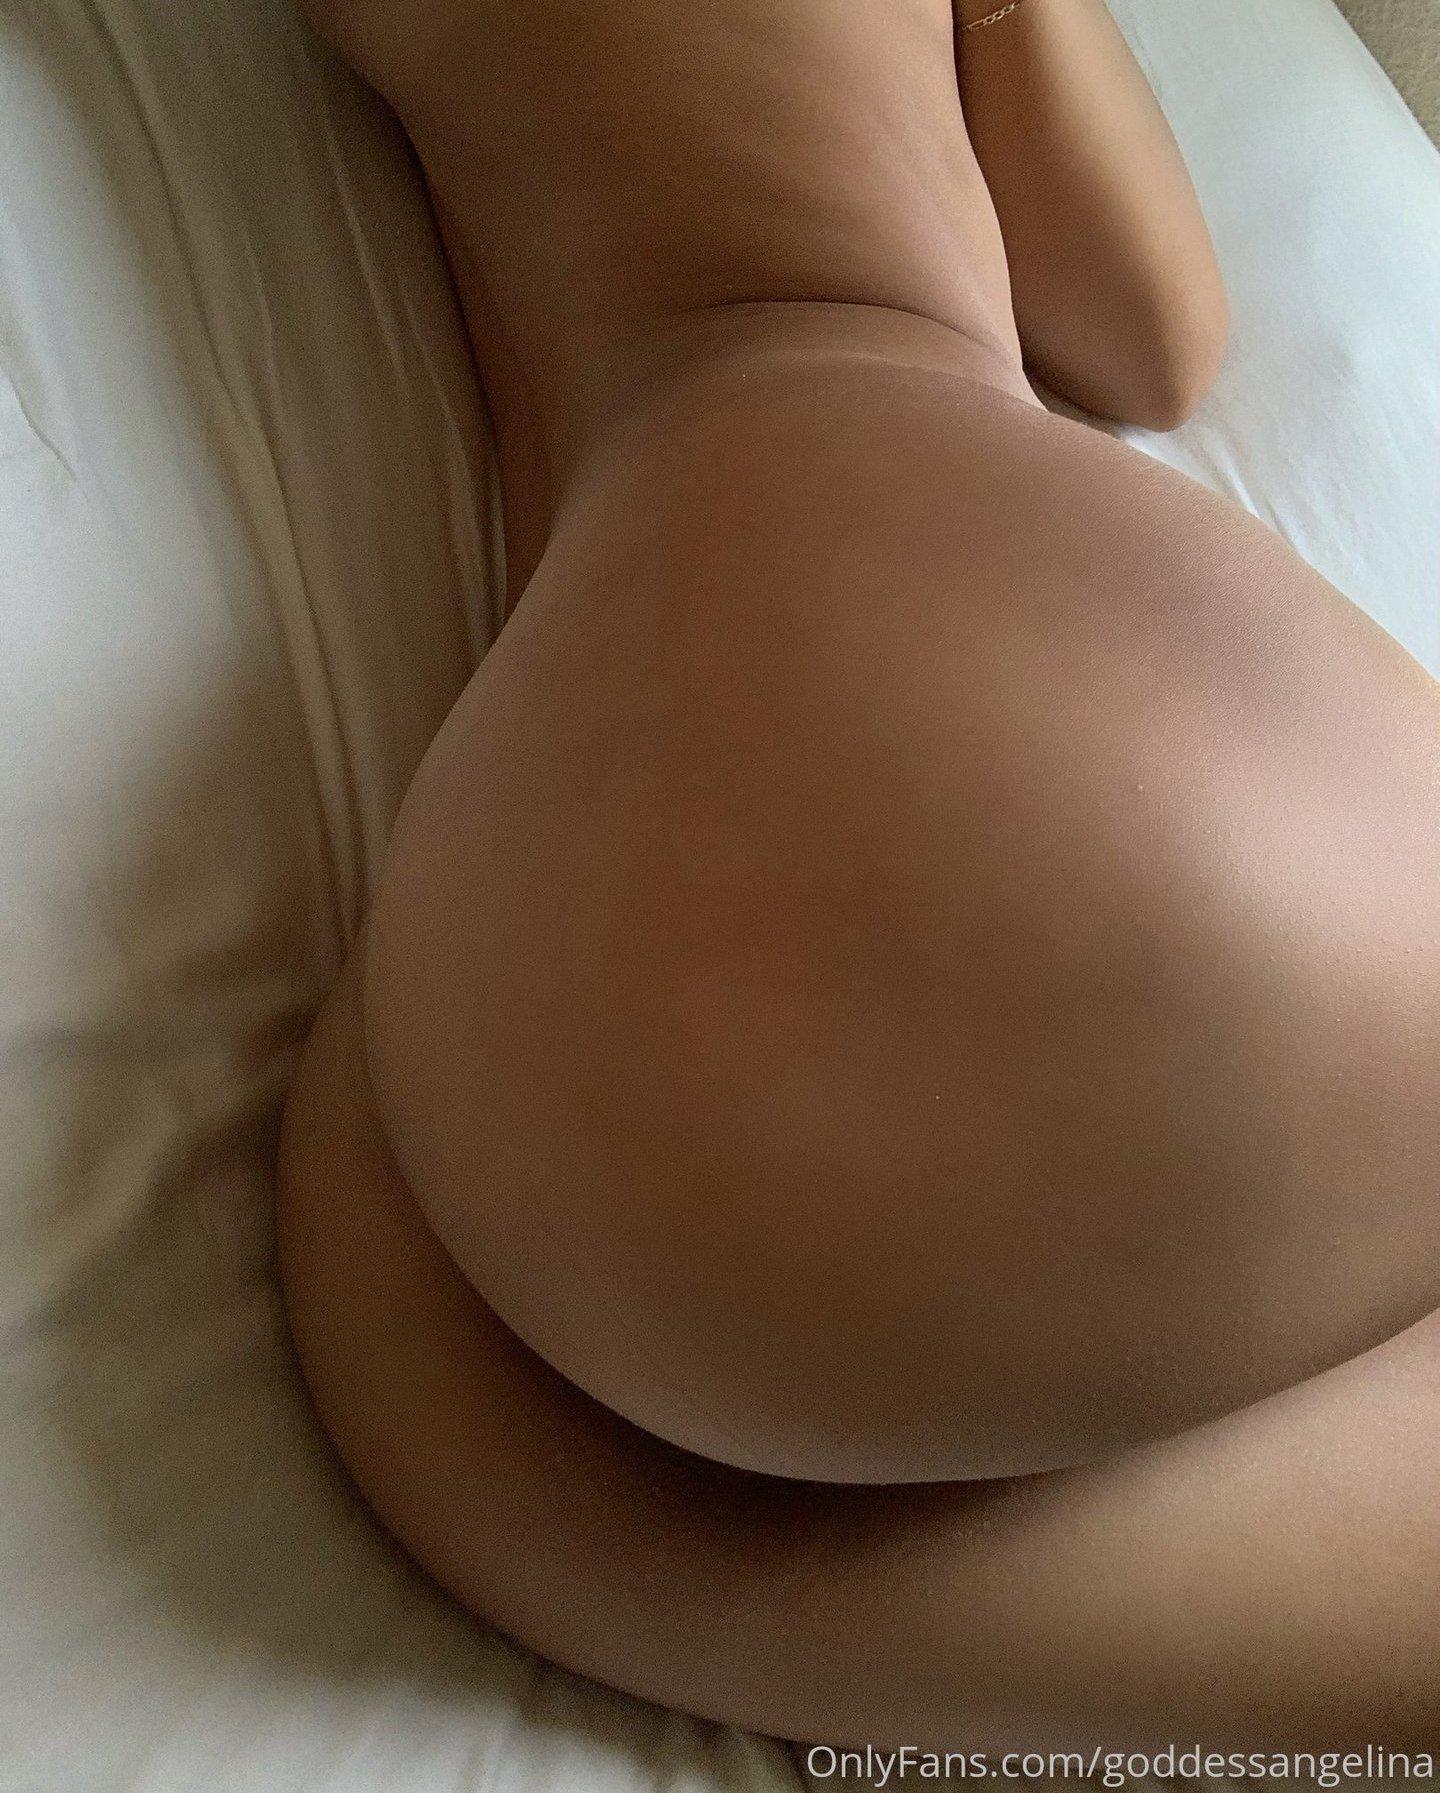 Goddess Angelina Angelina Onlyfans Nude Leaks 0016